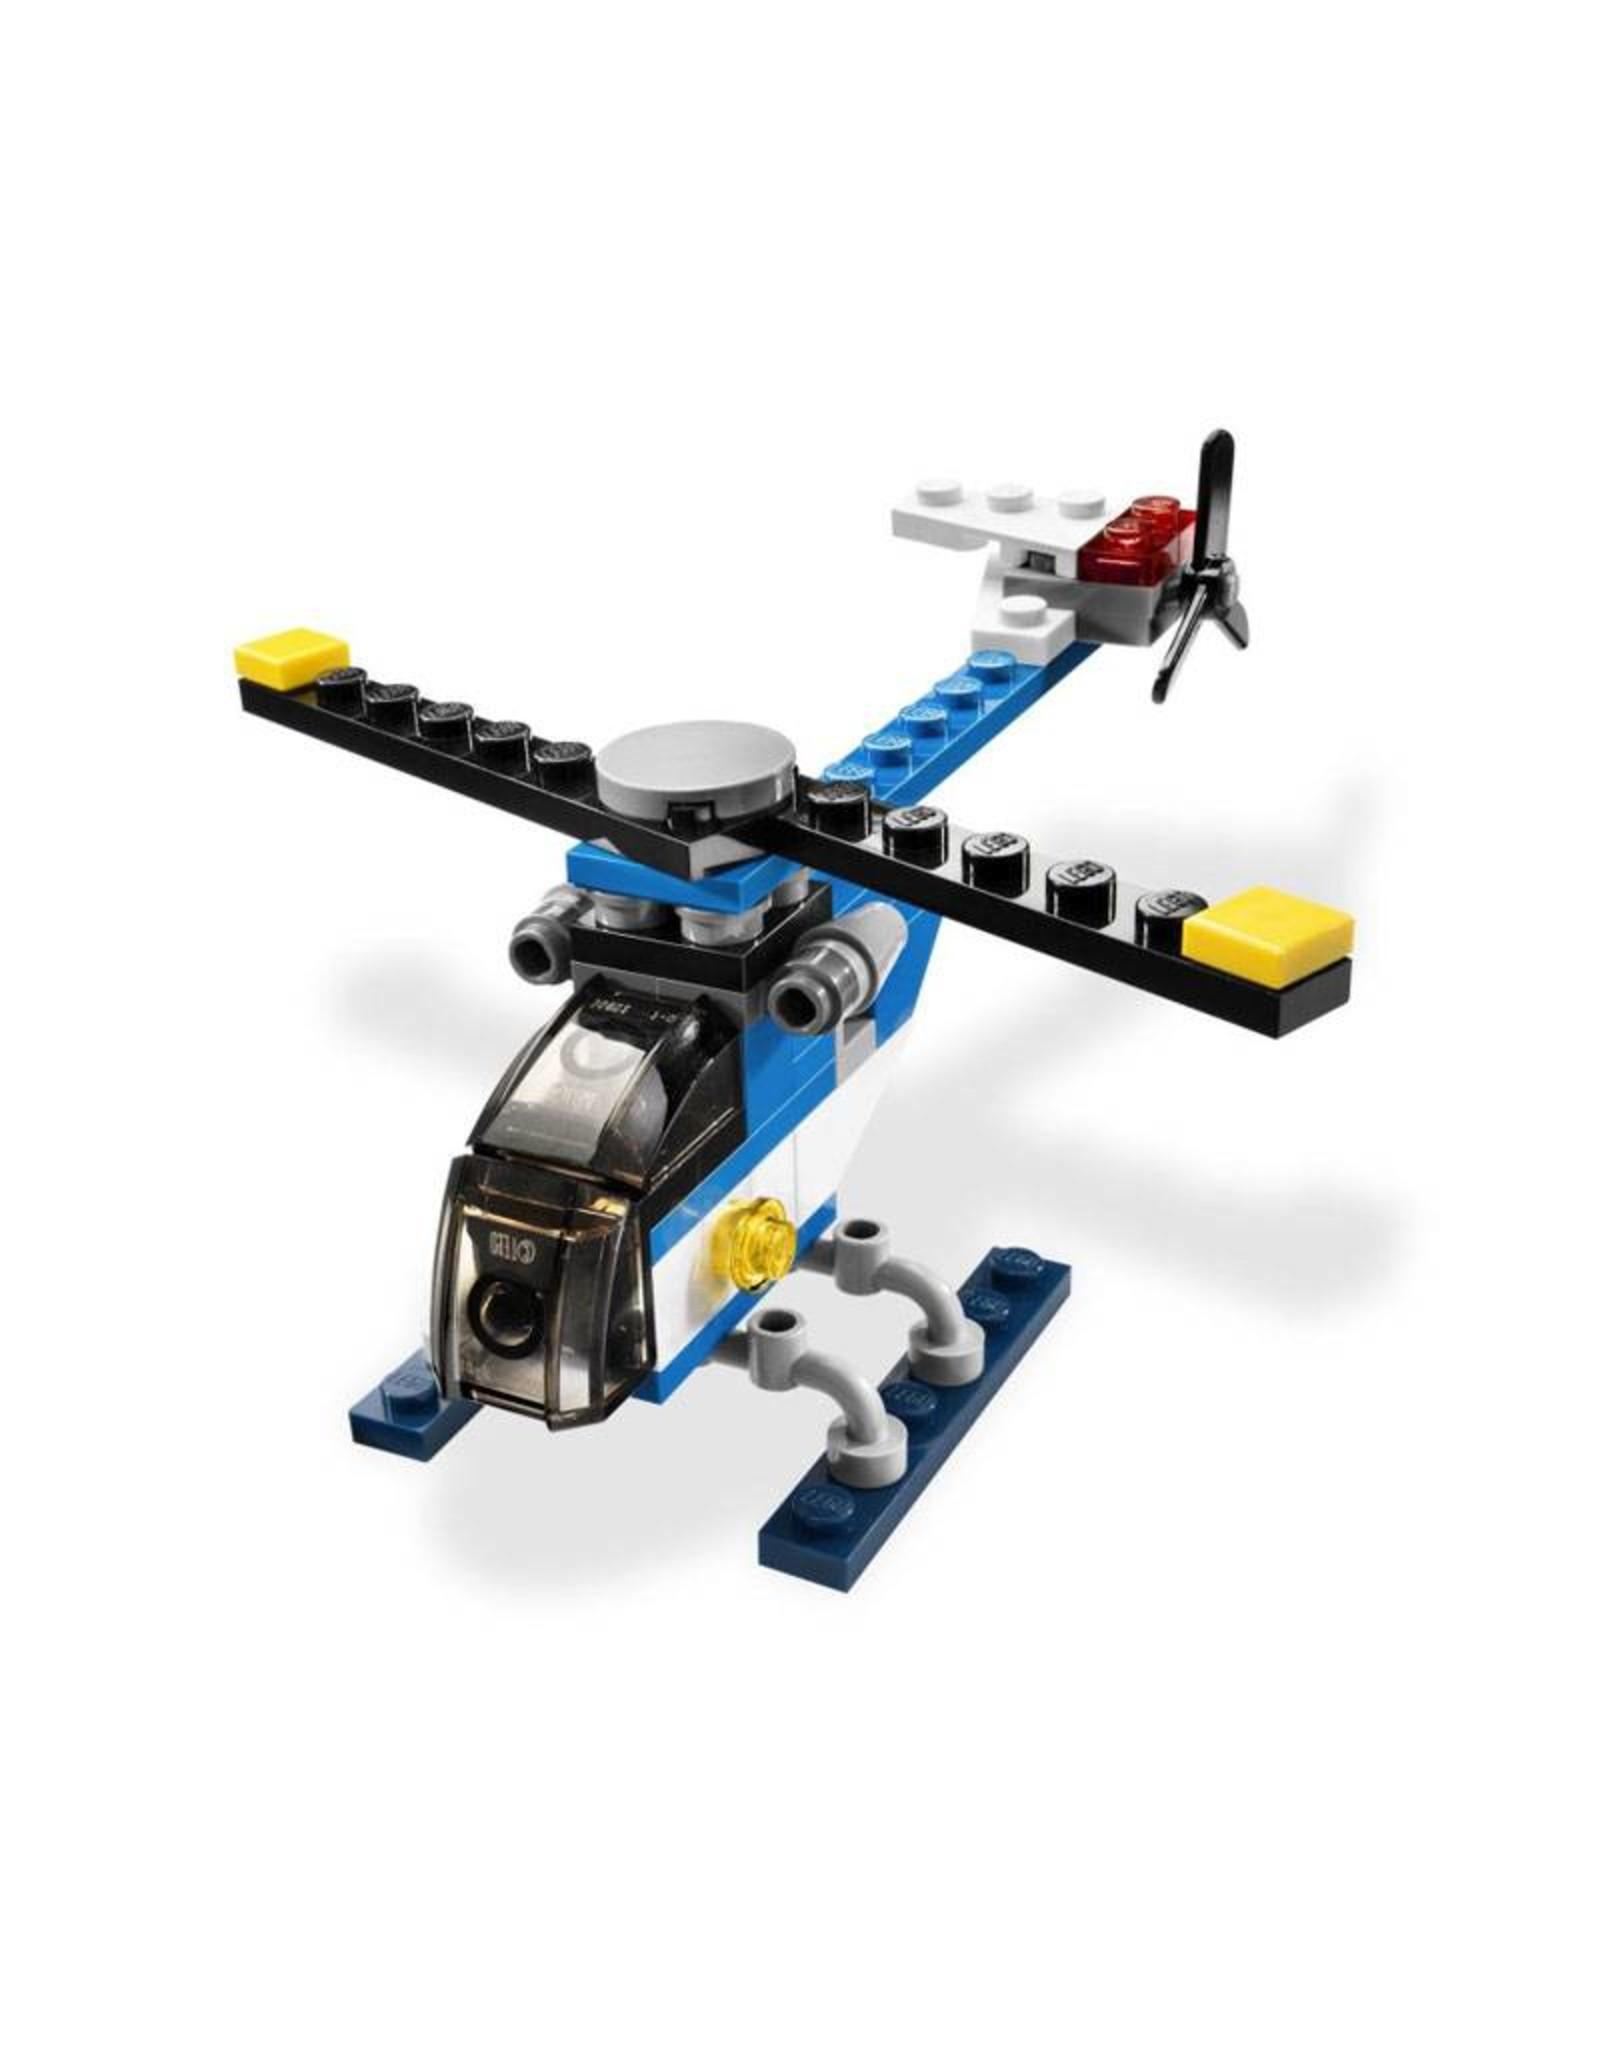 LEGO LEGO 5864 Helicopter blauw  CREATOR